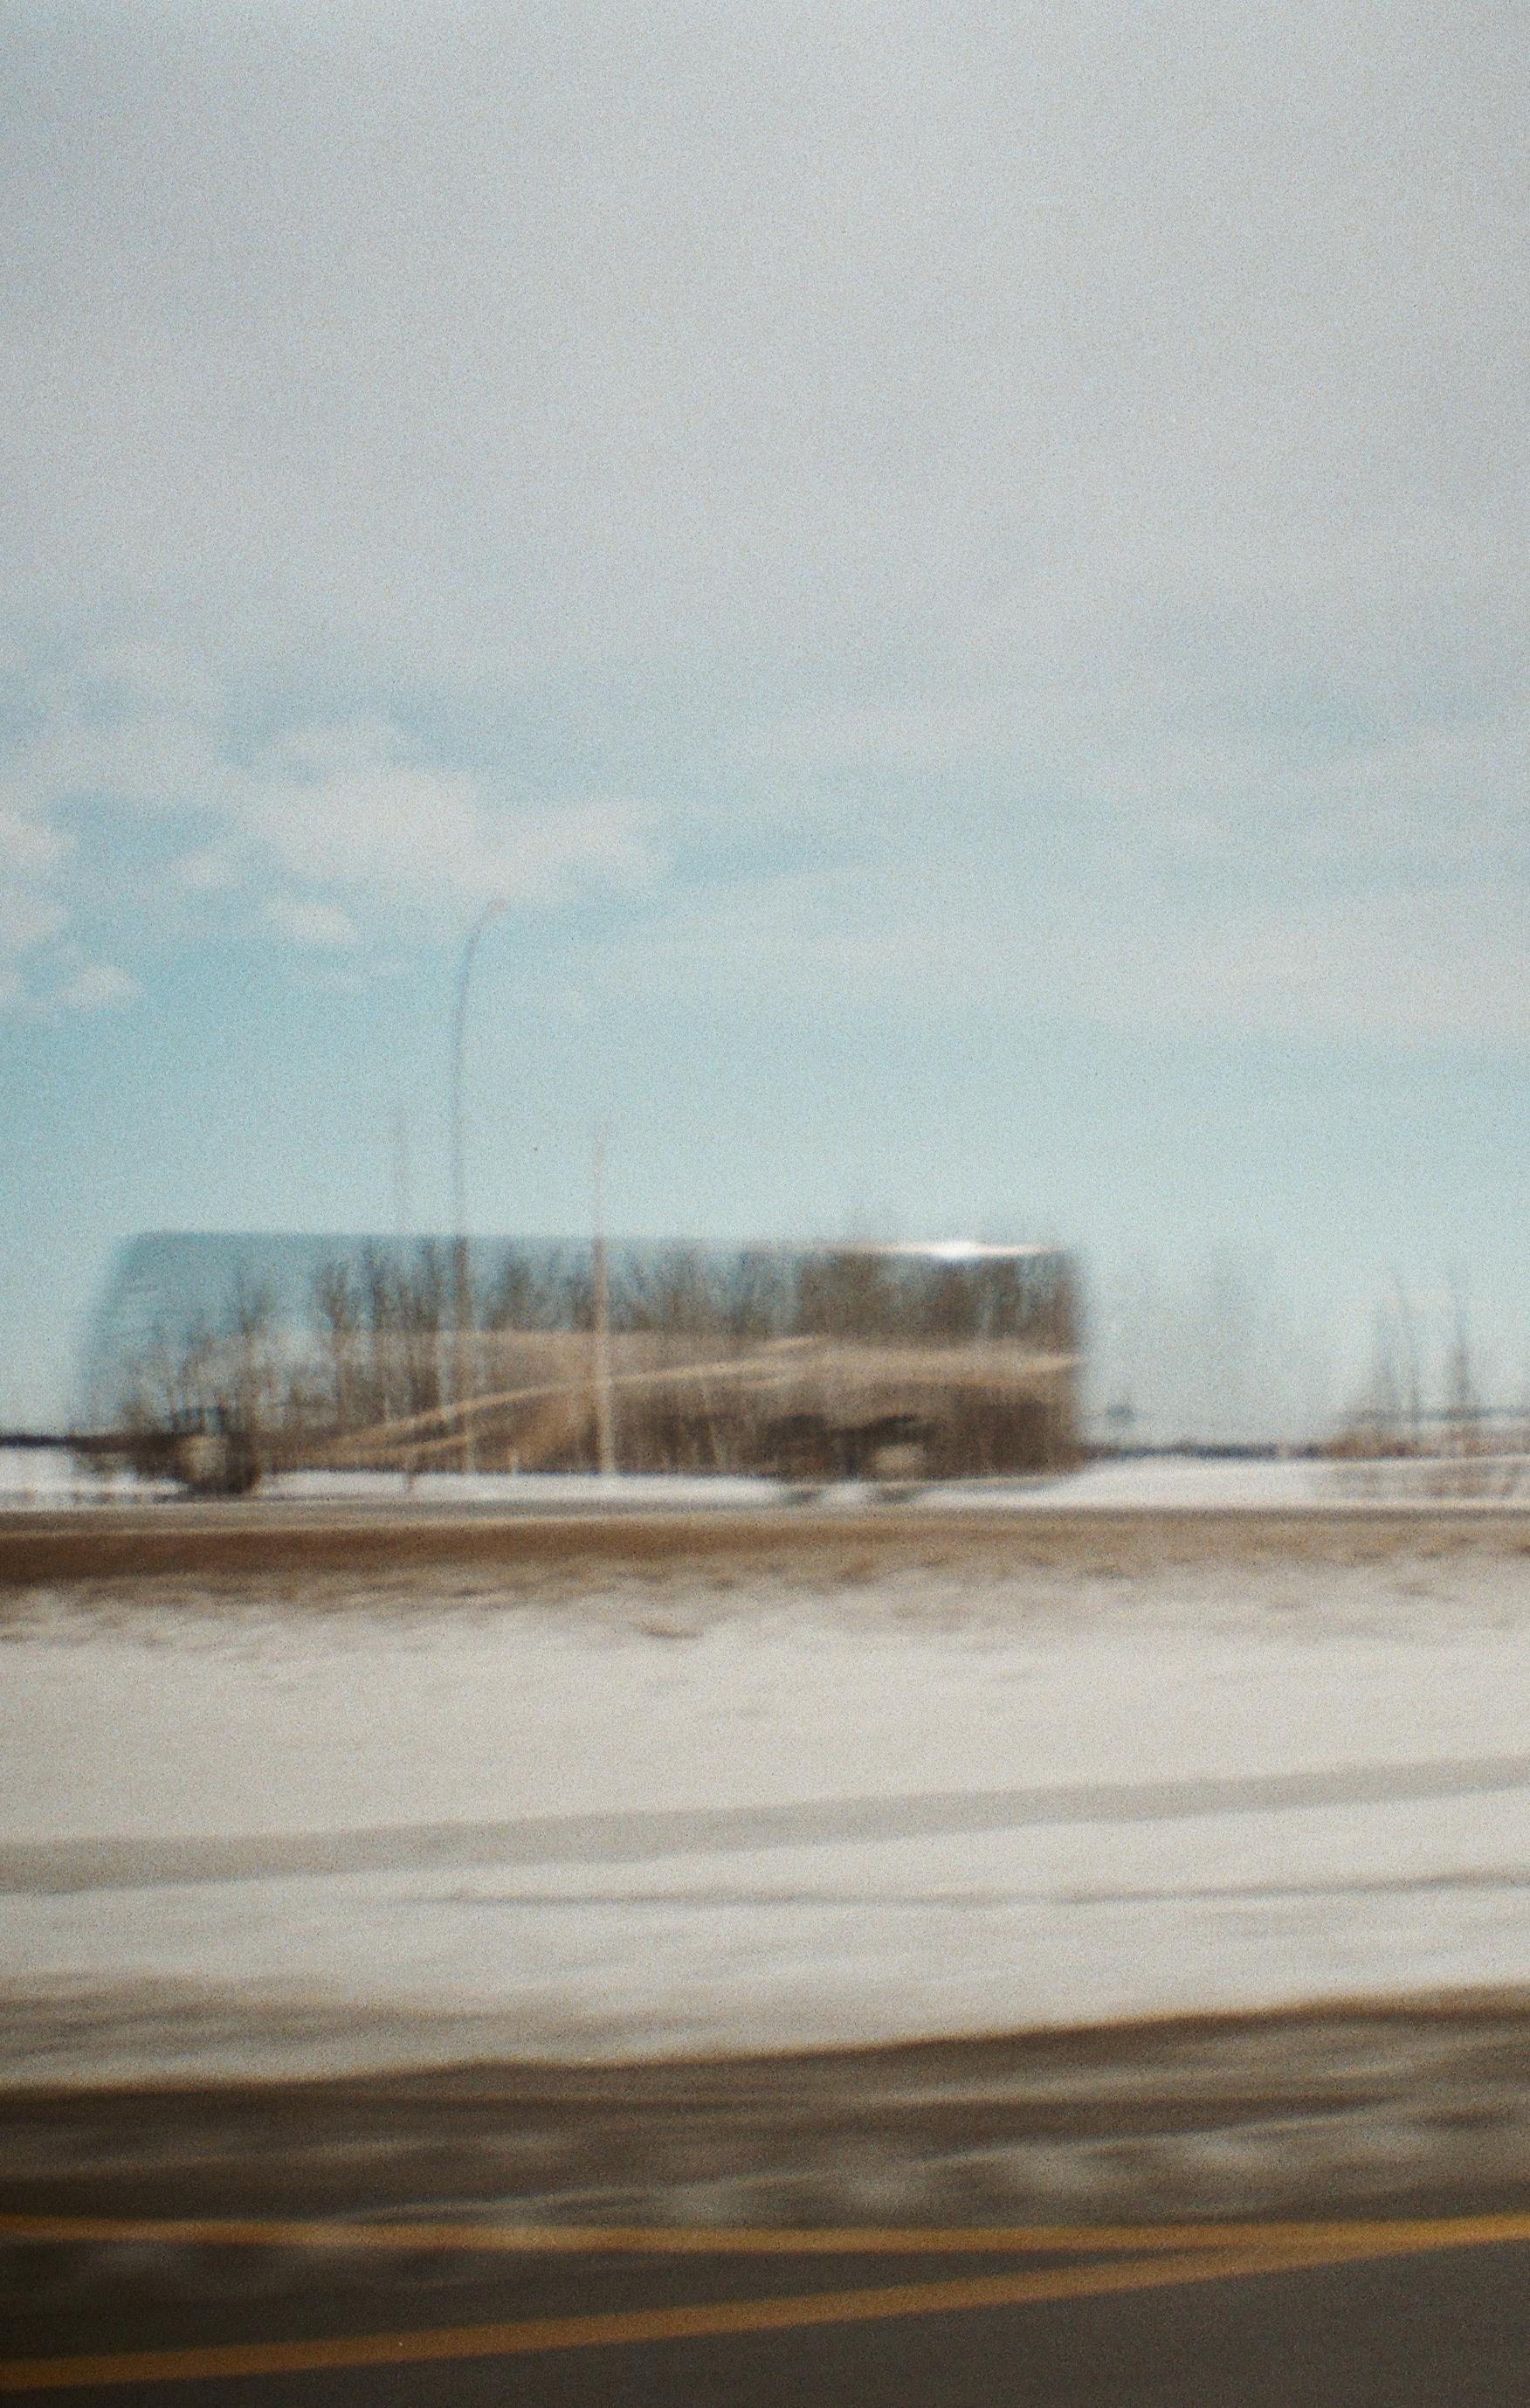 Ghost bus - 35mm - Diana Mini - Fujifilm Superia 400 - double exposure